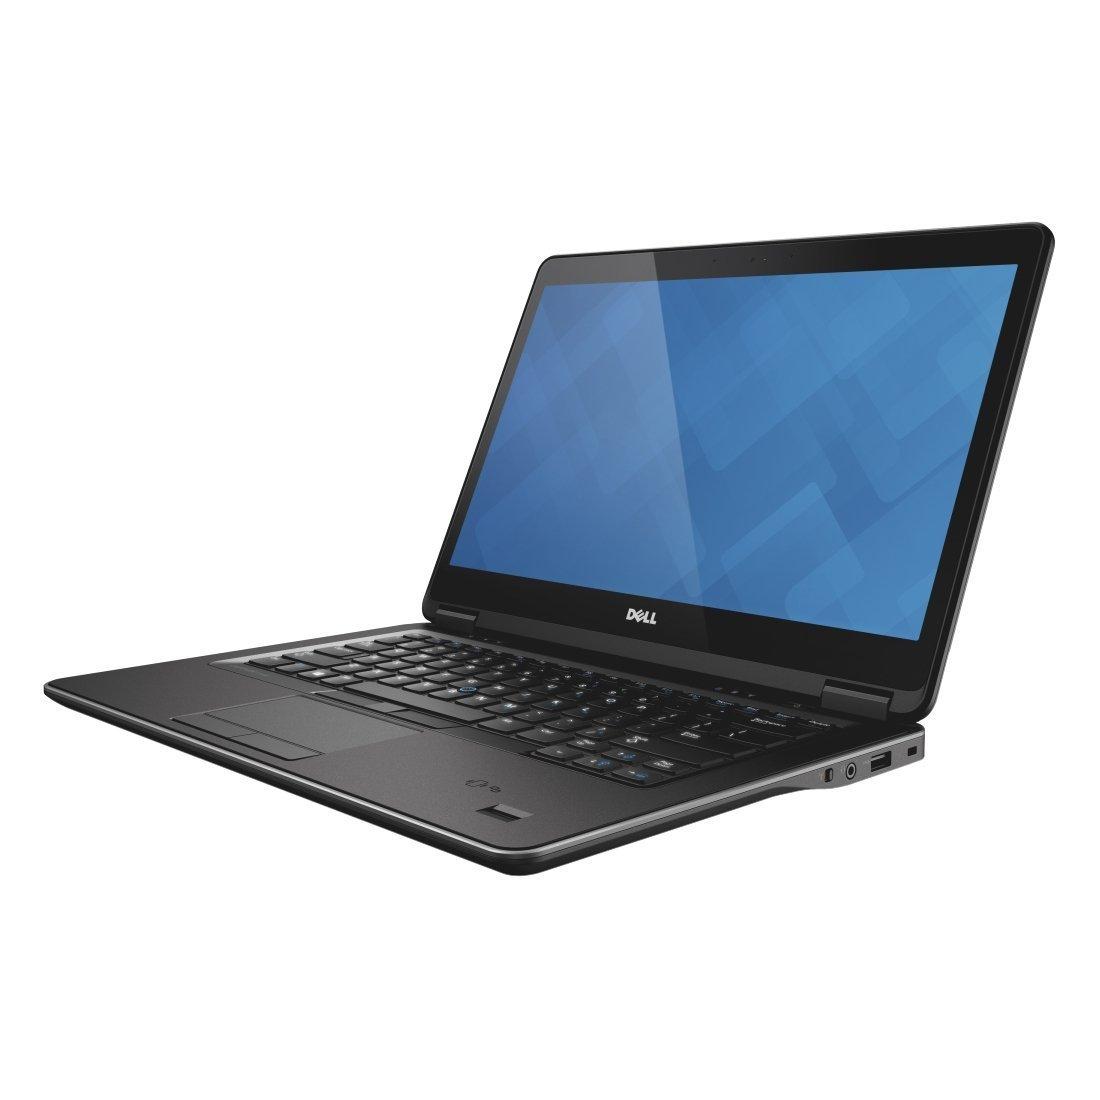 Dell Latitude E7440 14.1″ HD Business Laptop Computer, Intel Core i5-4200U up to 2.6GHz, 8GB RAM, 128GB SSD, USB 3.0, Bluetooth 4.0, HDMI, WiFi, Windows 10 Professional (Certified Refurisbhed)